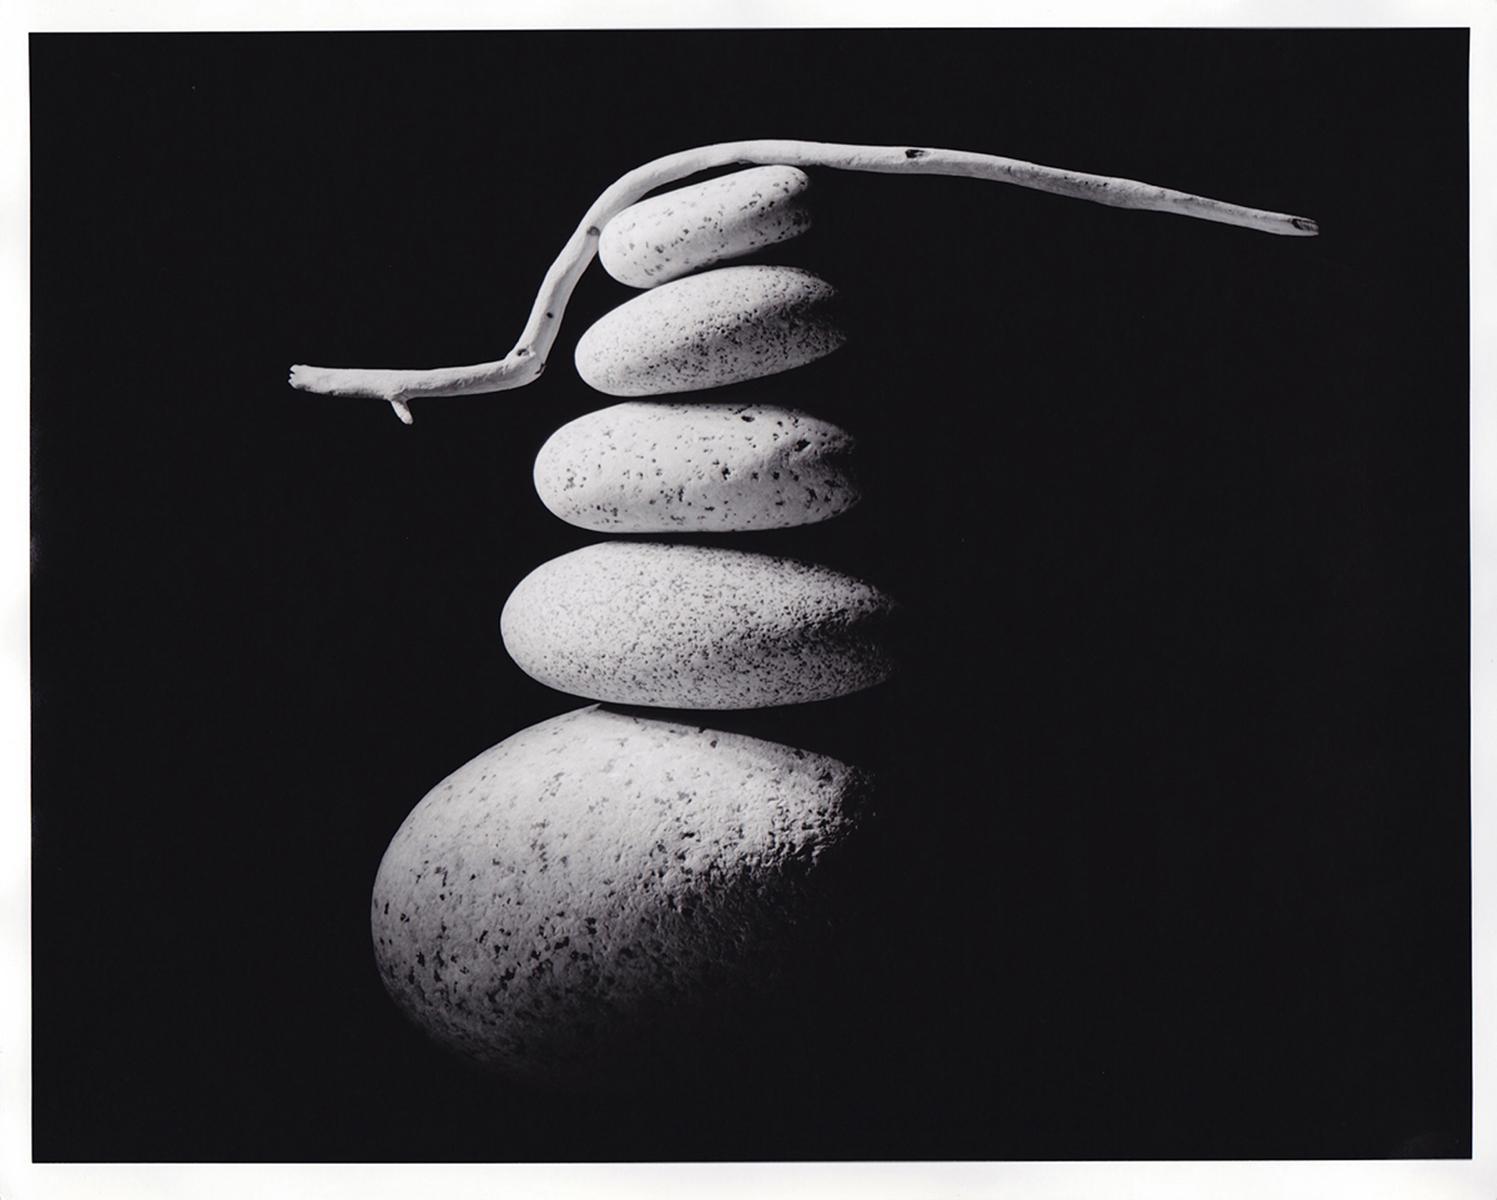 David Piemonte Photography